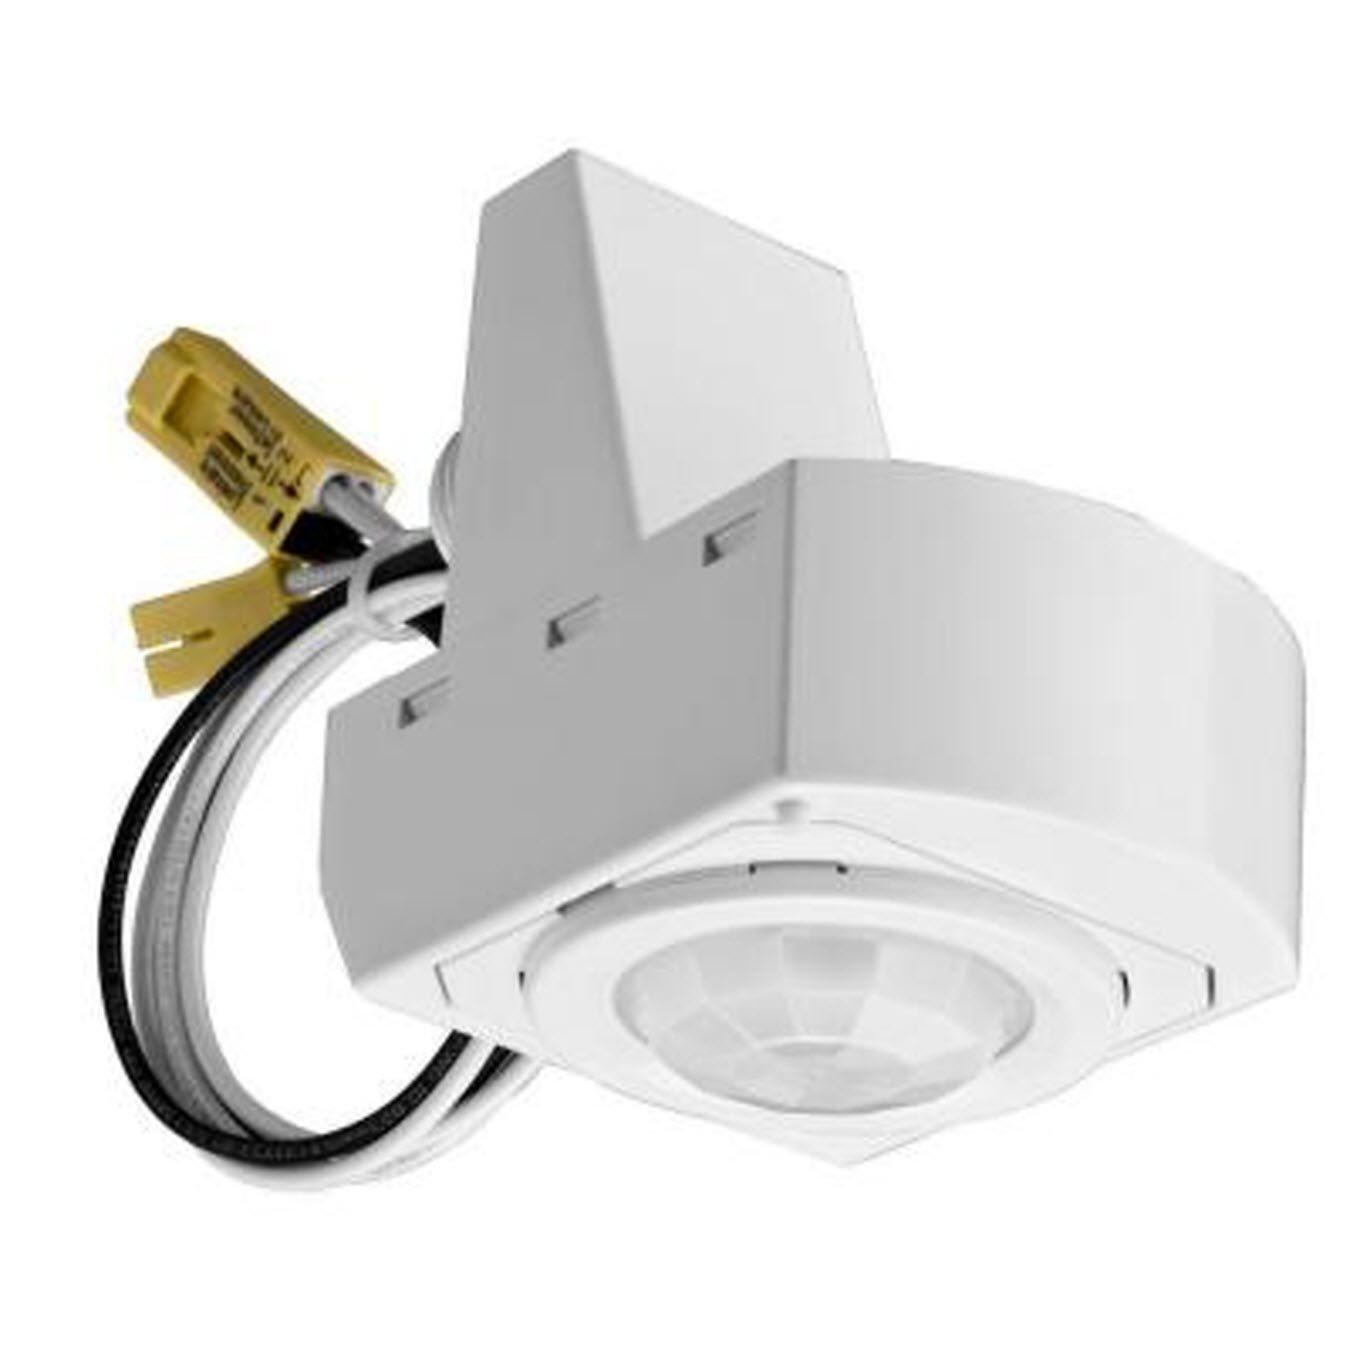 Sensor Switch MSX12 M4 Fixture Mount Occupancy Sensor, White